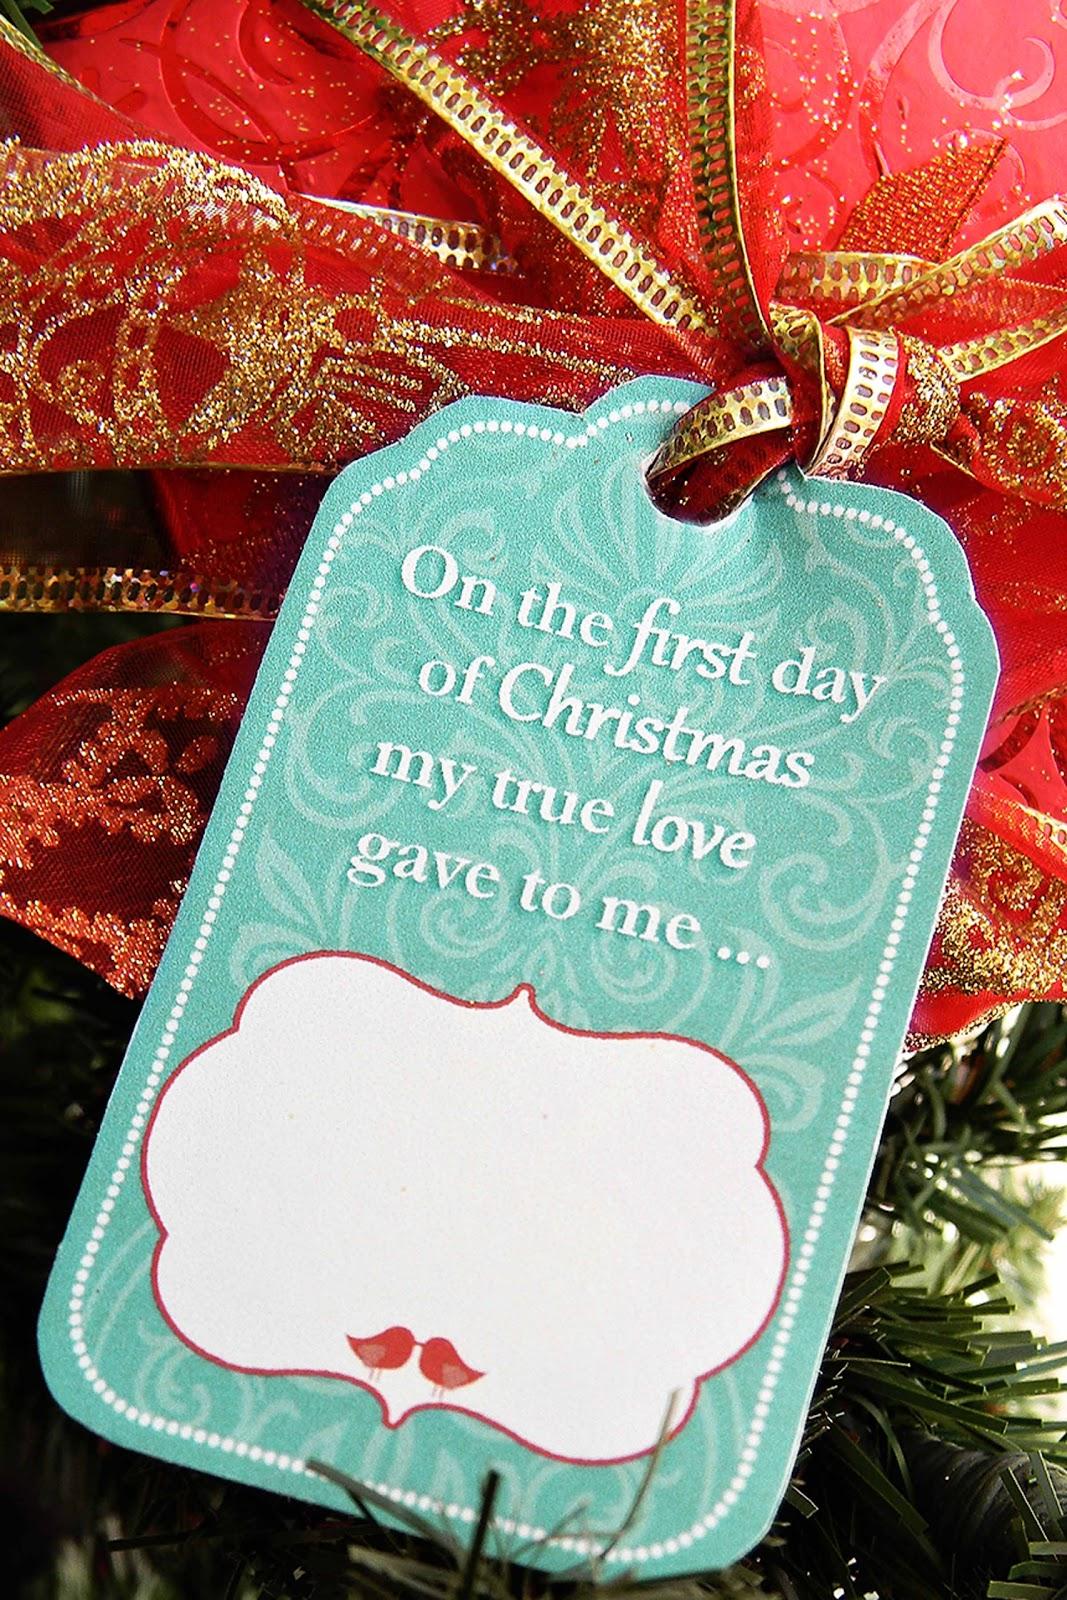 12 days of christmas gift calendar